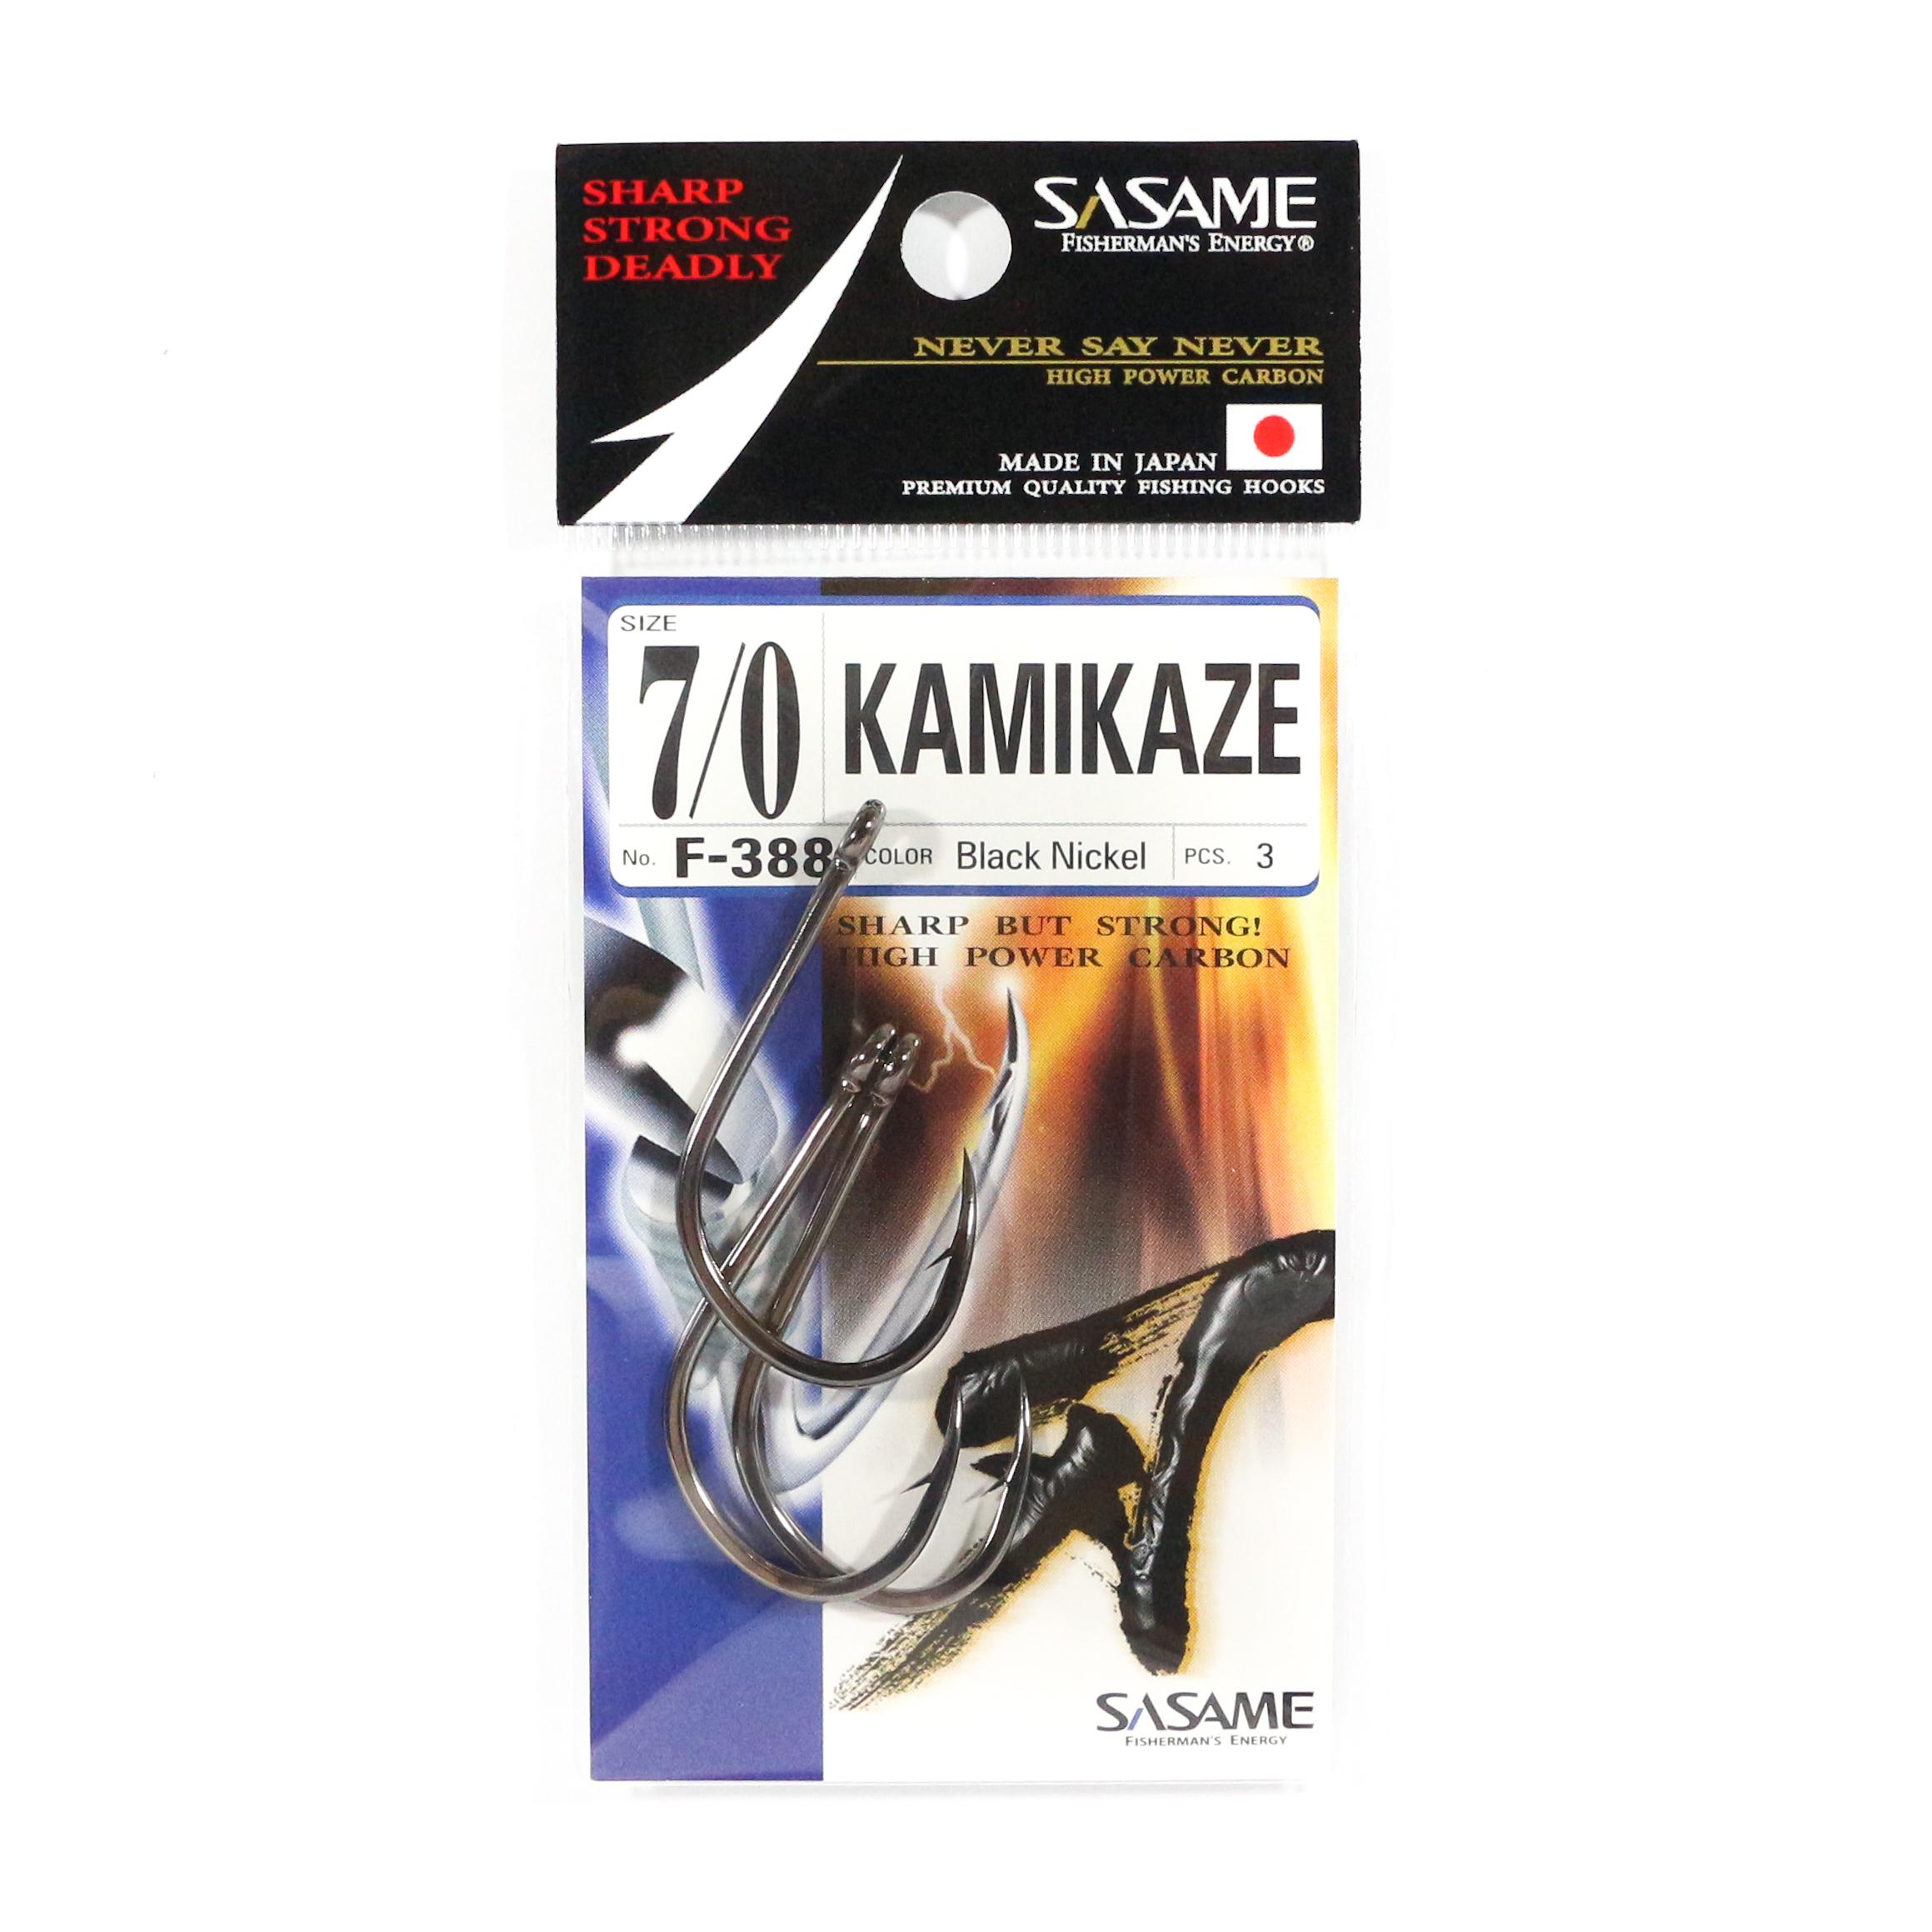 Sasame F-388 Kamikaze Straight Shank Offset Hook Size 7/0 (4811)